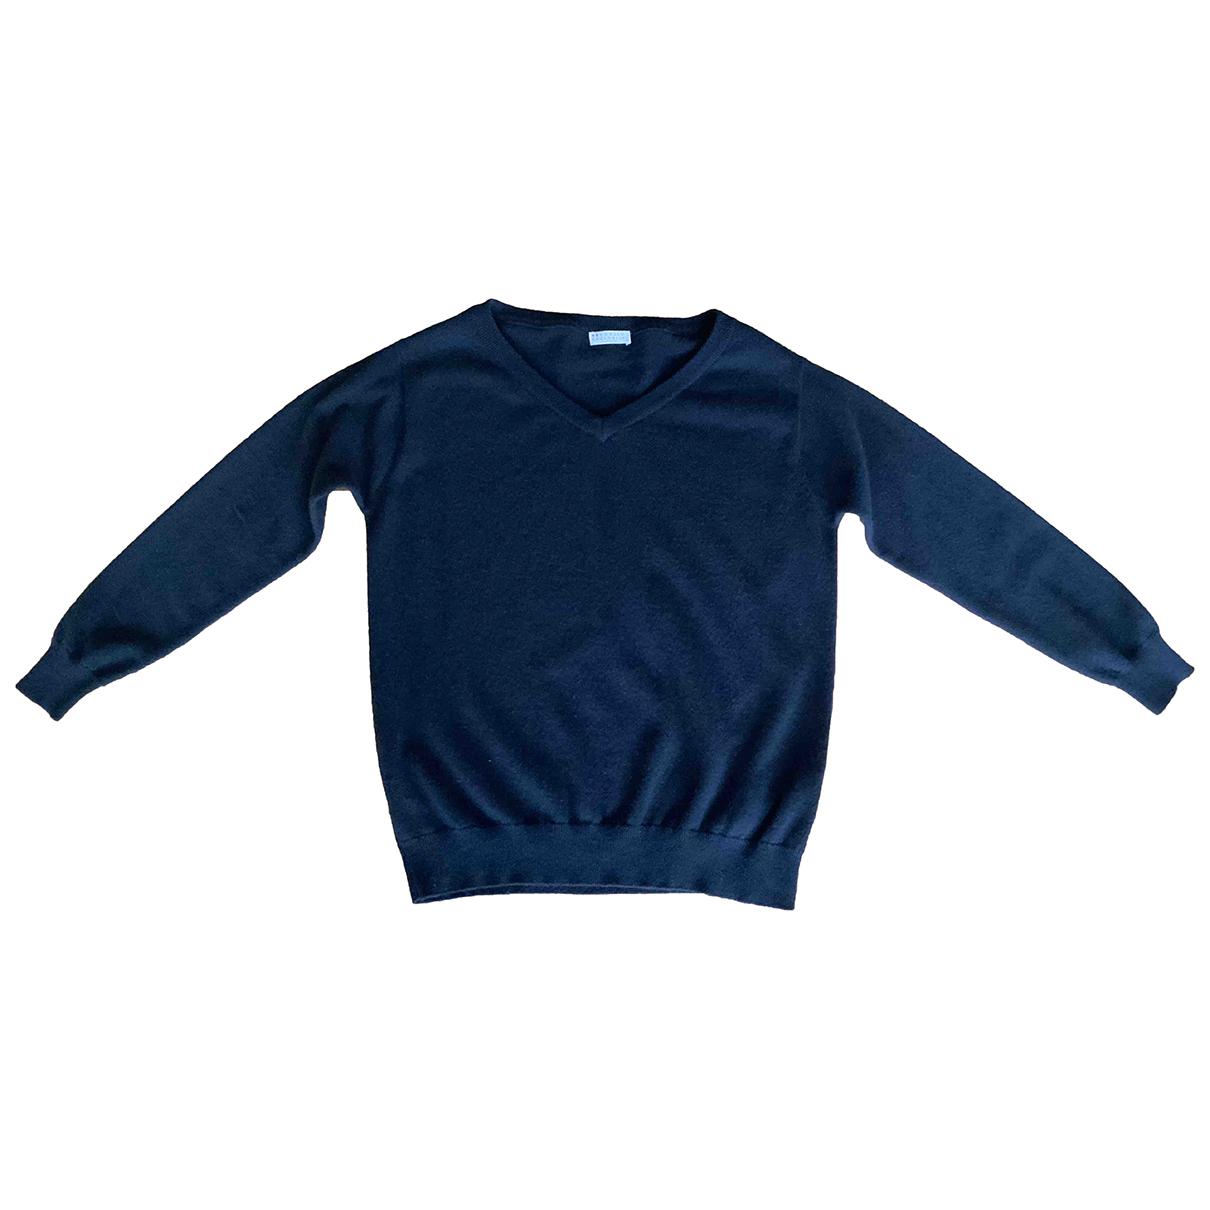 Brunello Cucinelli N Blue Cashmere Knitwear for Women S International